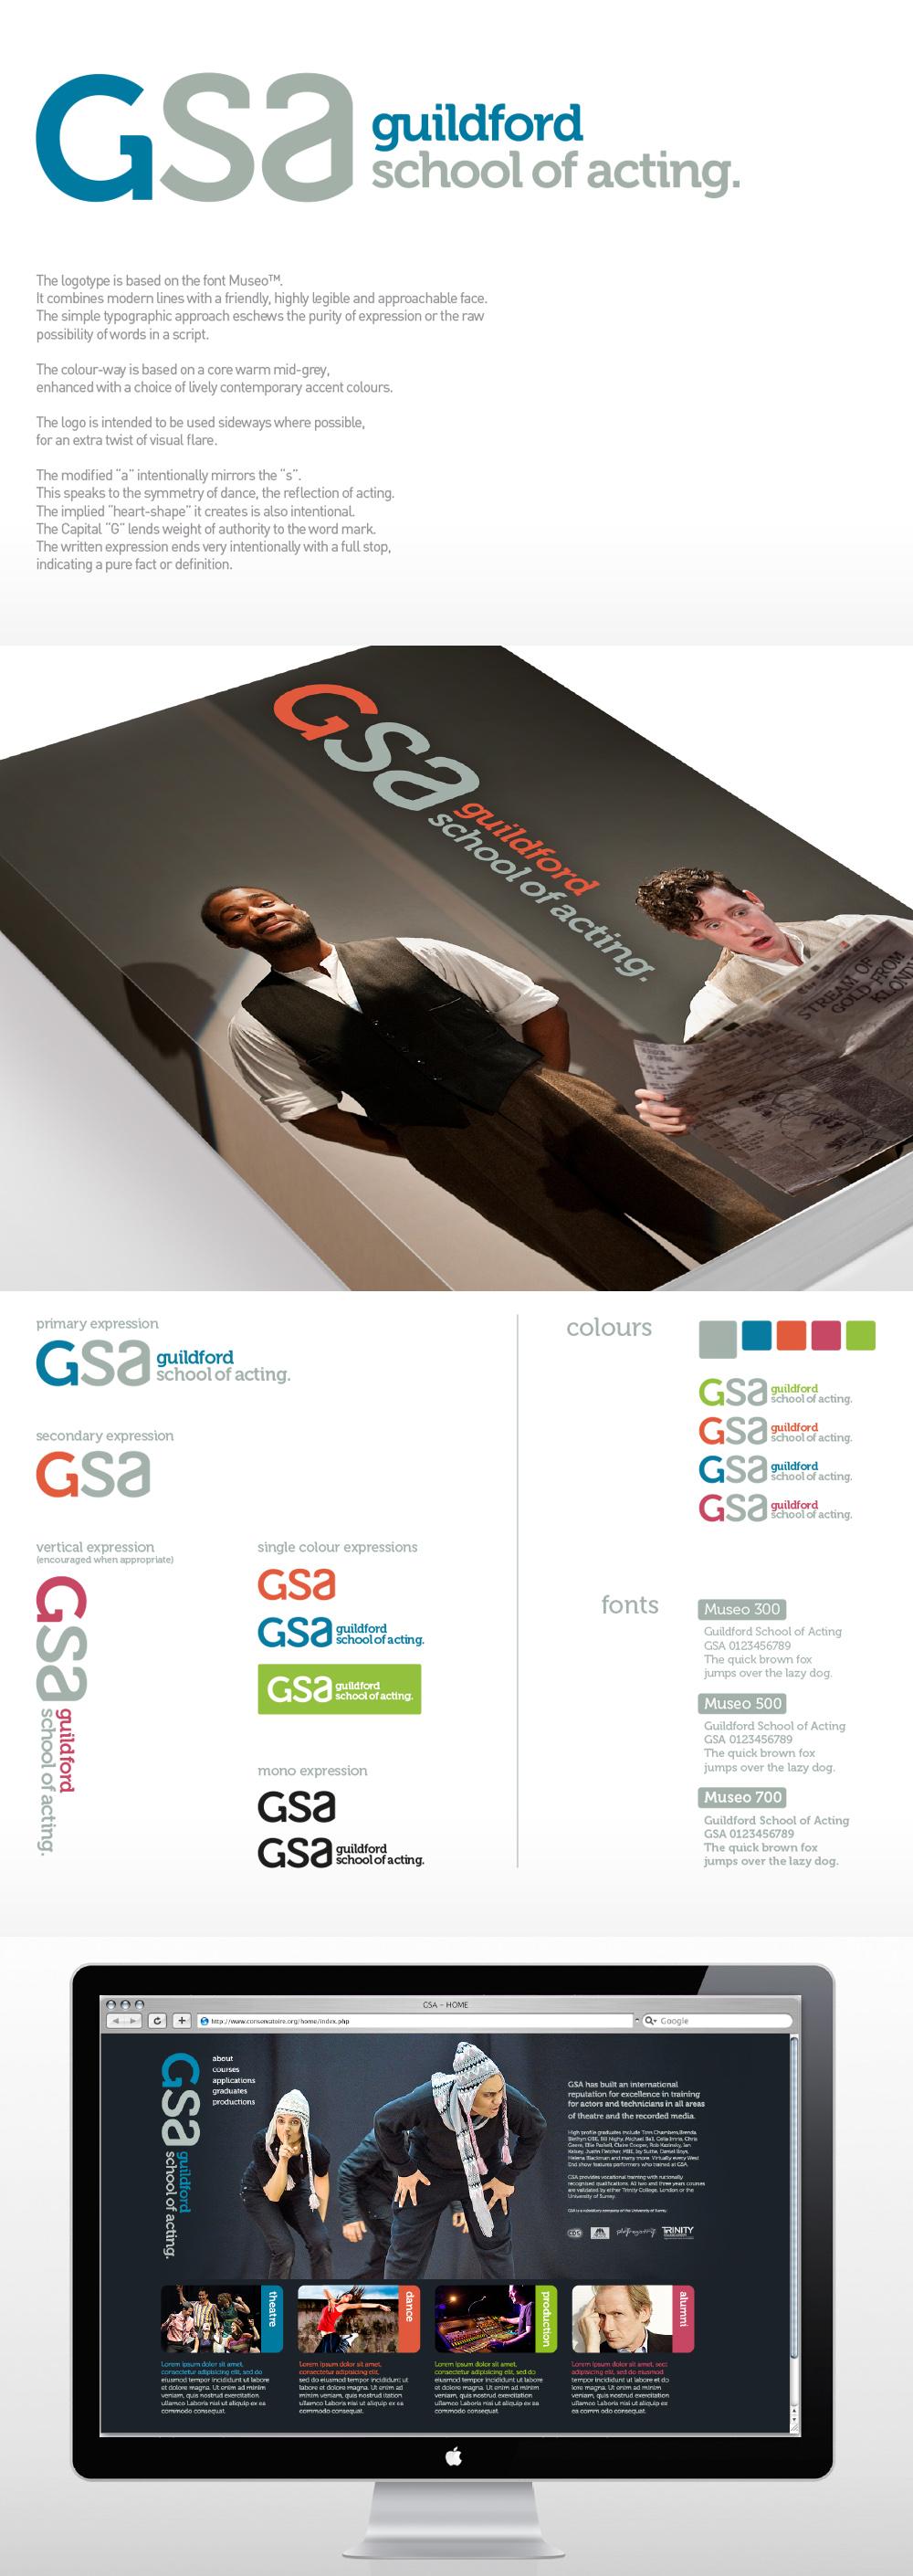 GSA_Visual_ID.jpg